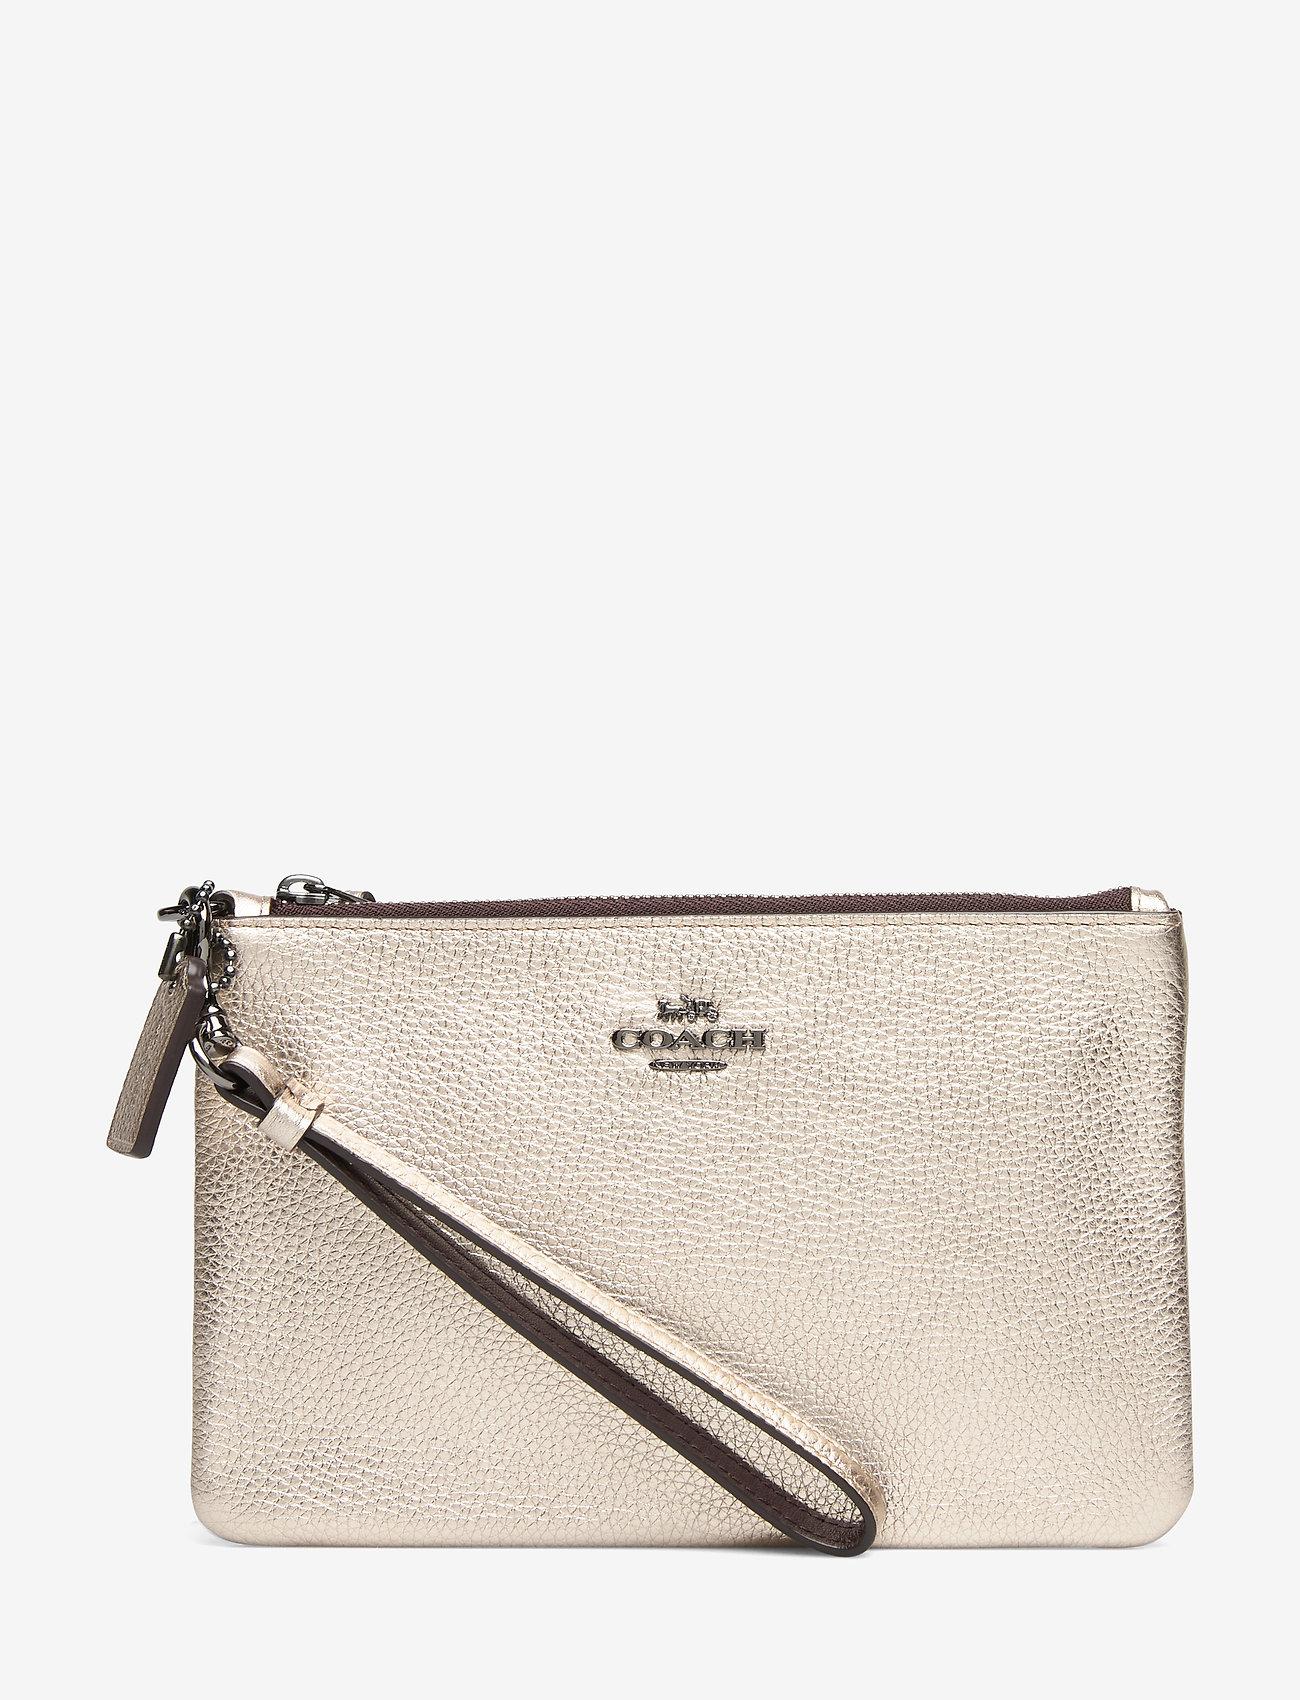 Coach - Metallic Small Wristlet - kirjekuorilaukut - gm/platinum - 0